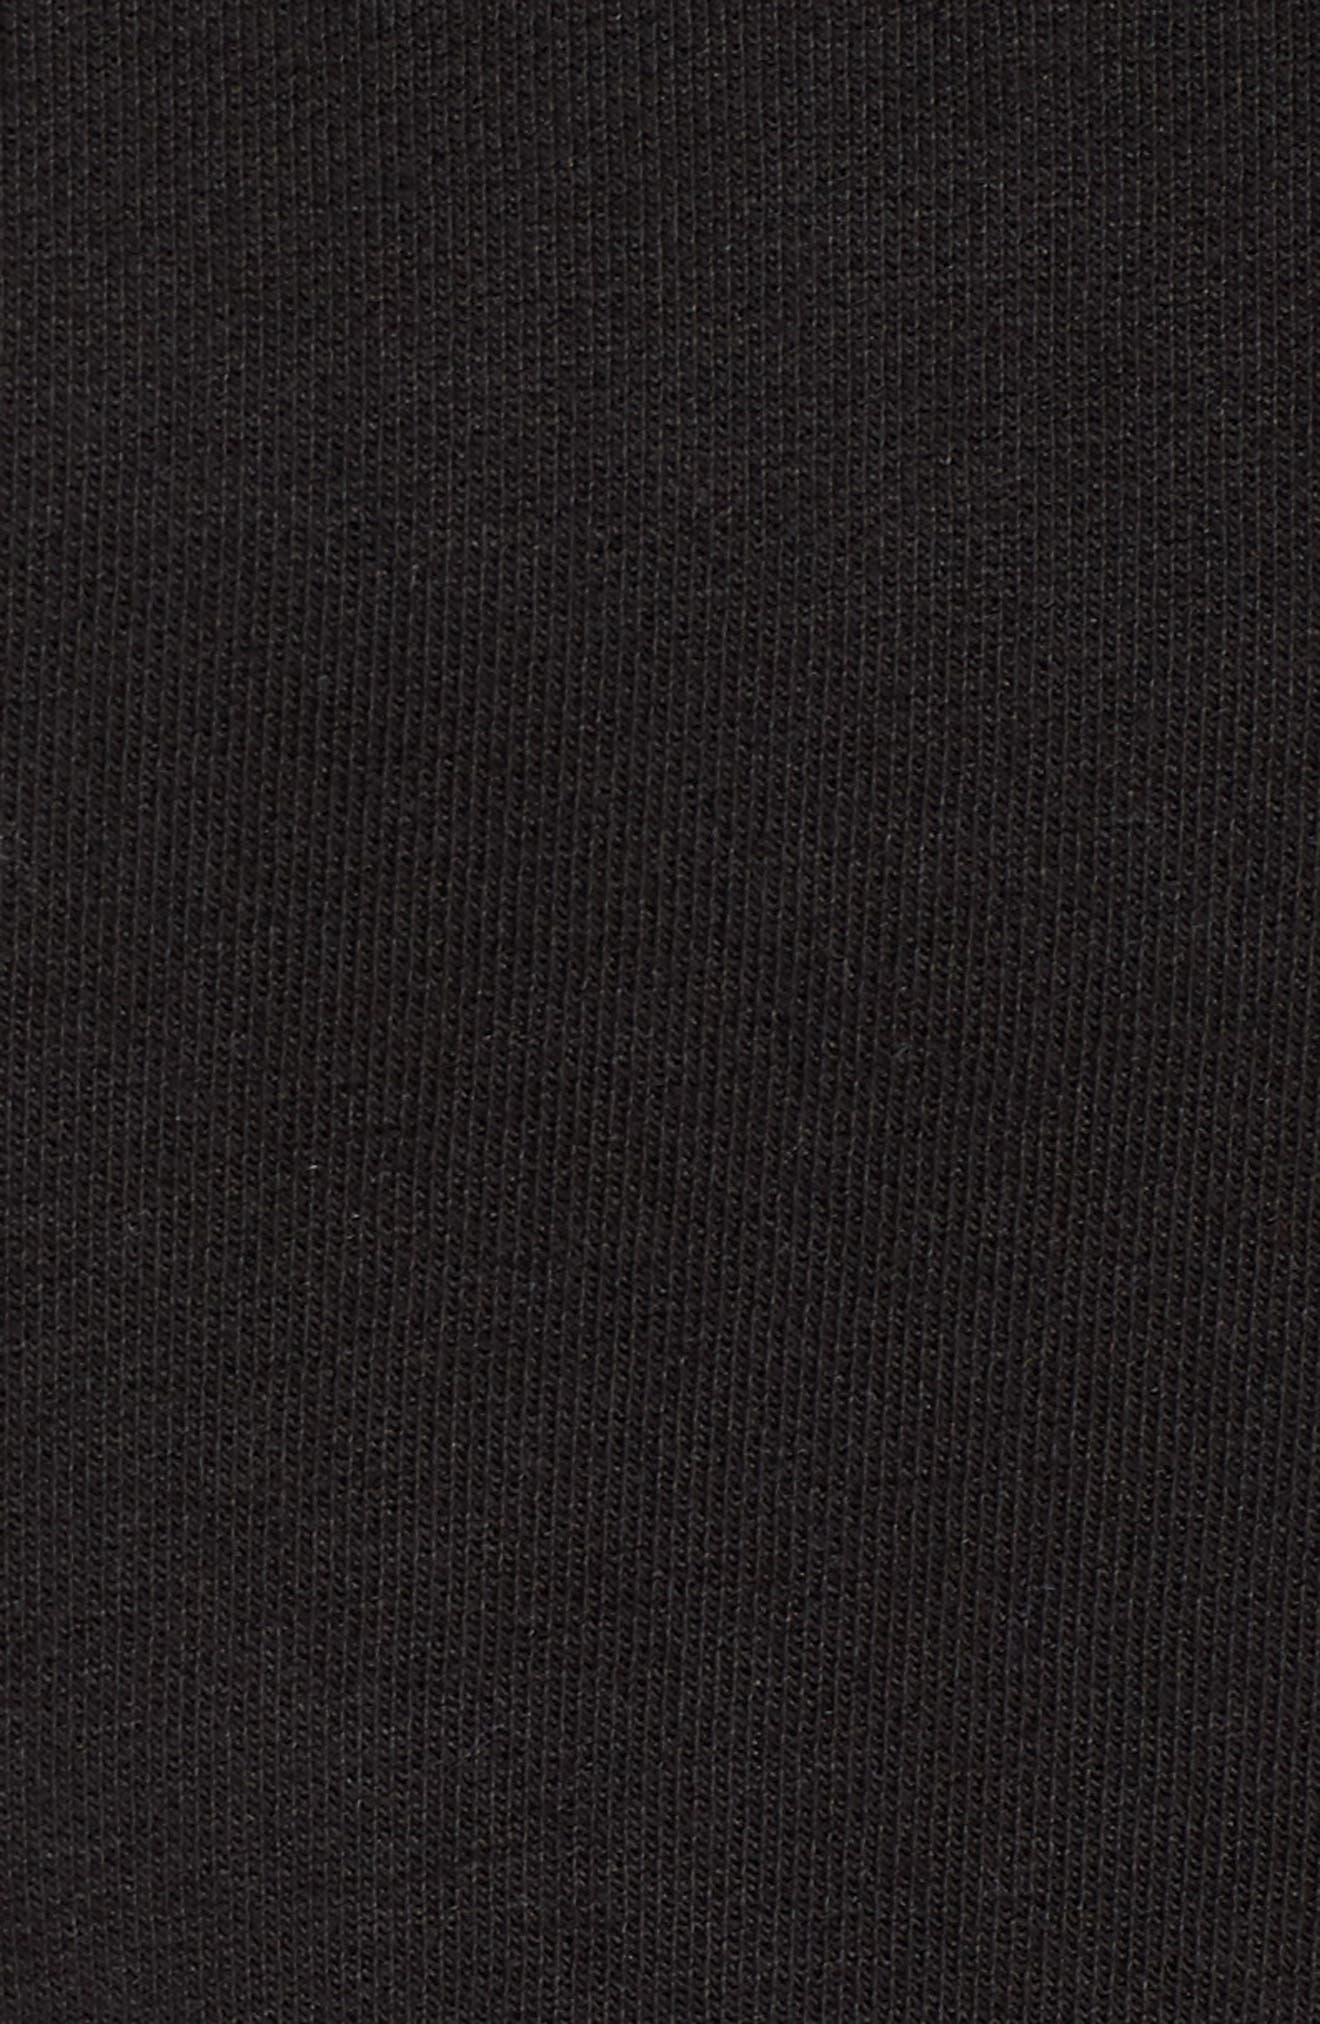 PUMA by Rihanna Graphic Short Sleeve Crop Sweatshirt,                             Alternate thumbnail 6, color,                             001